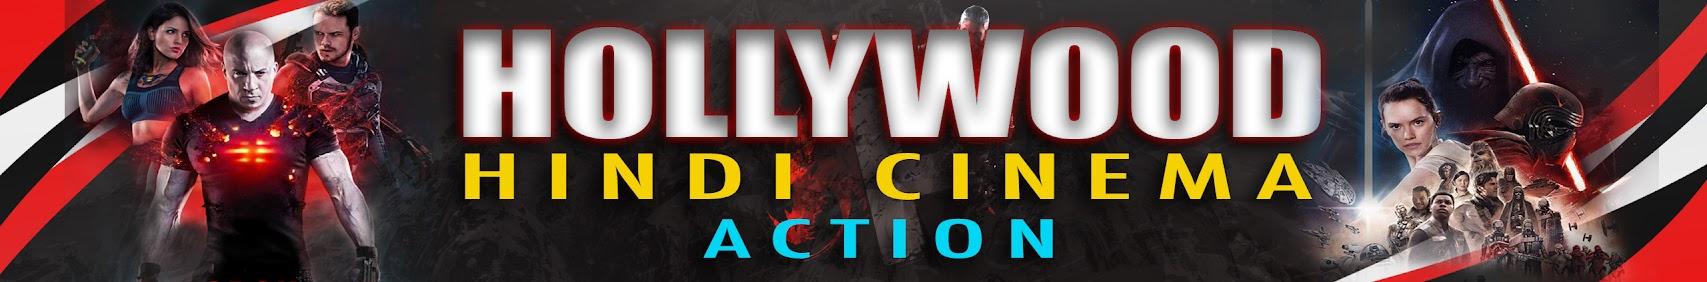 Hollywood Hindi Cinema Ação